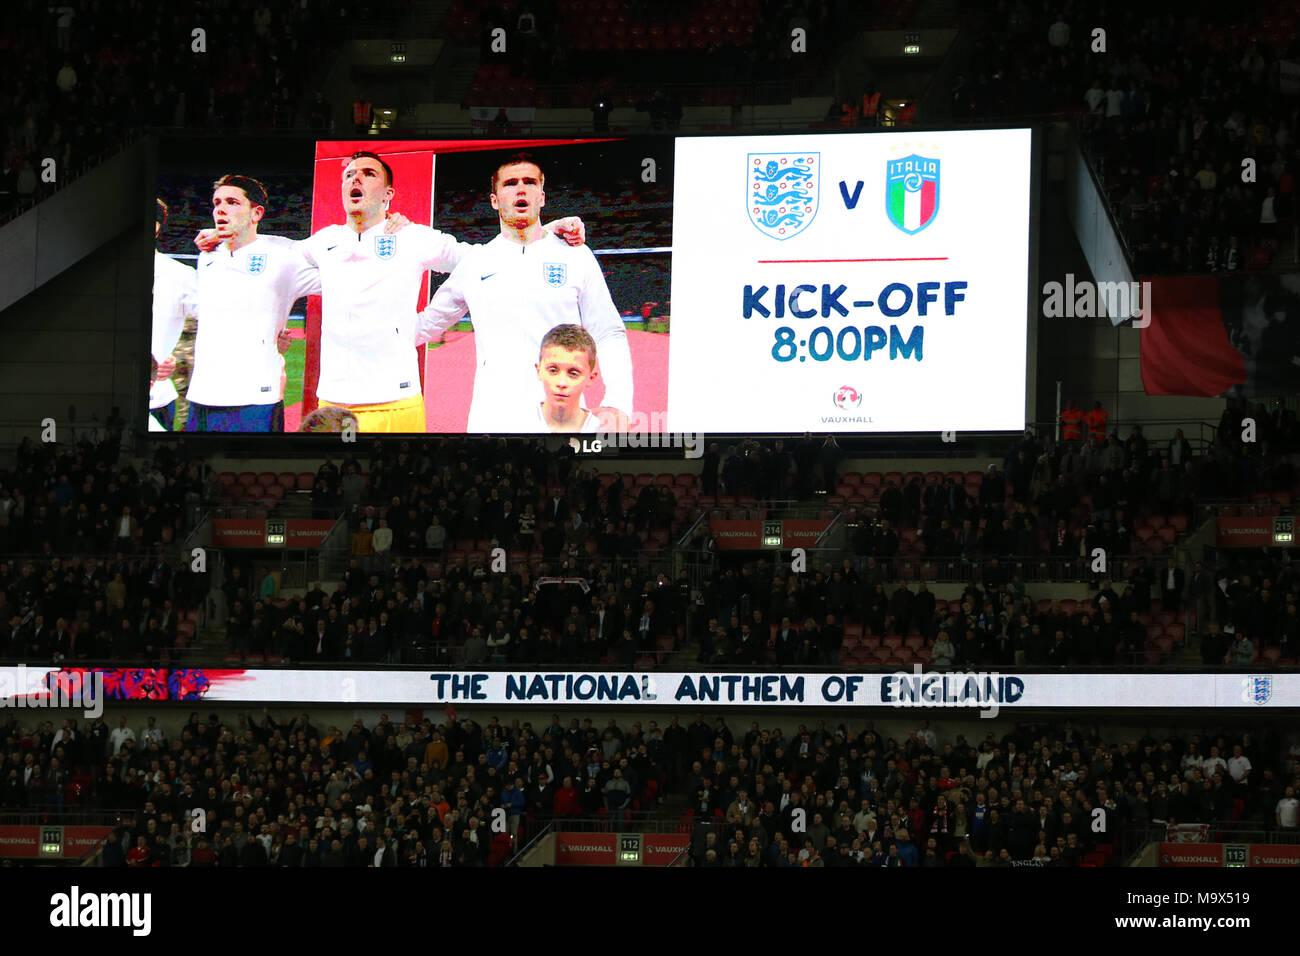 England National Anthem Stock Photos & England National Anthem Stock